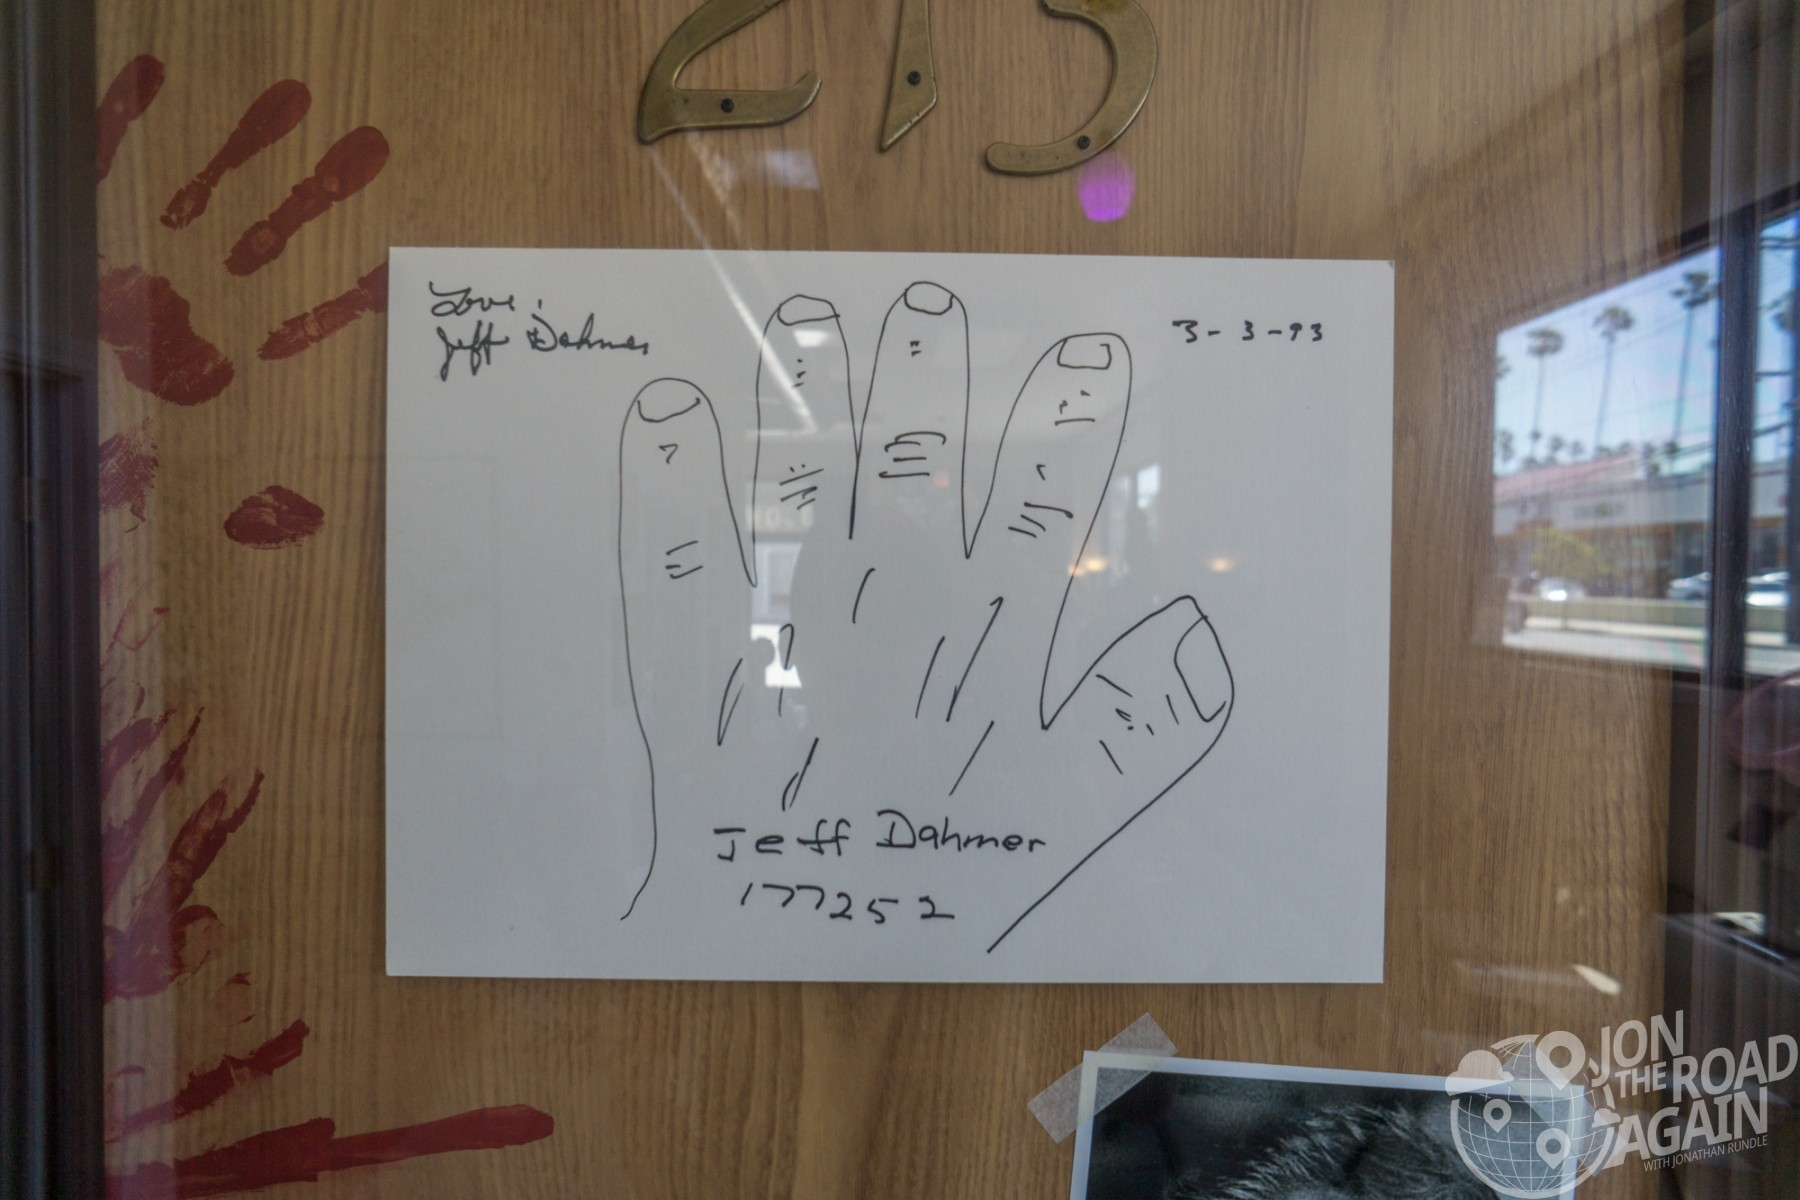 Jeffrey Dahmer prison note drawing